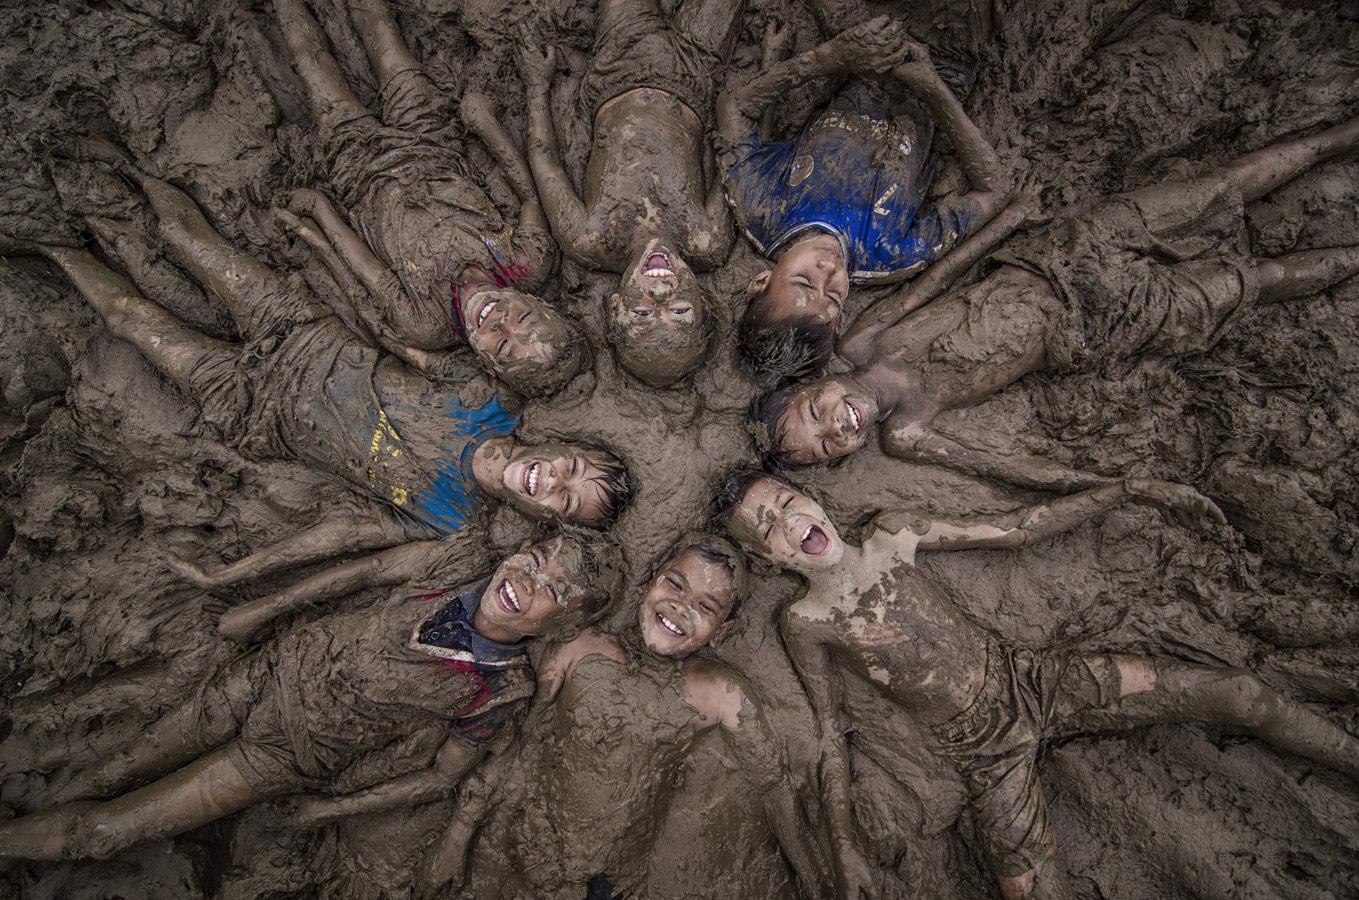 Happy Childrens, © Daniel Saputra, Indonesia, Children photo Nomination, 2 place, 35AWARDS Photo Contest